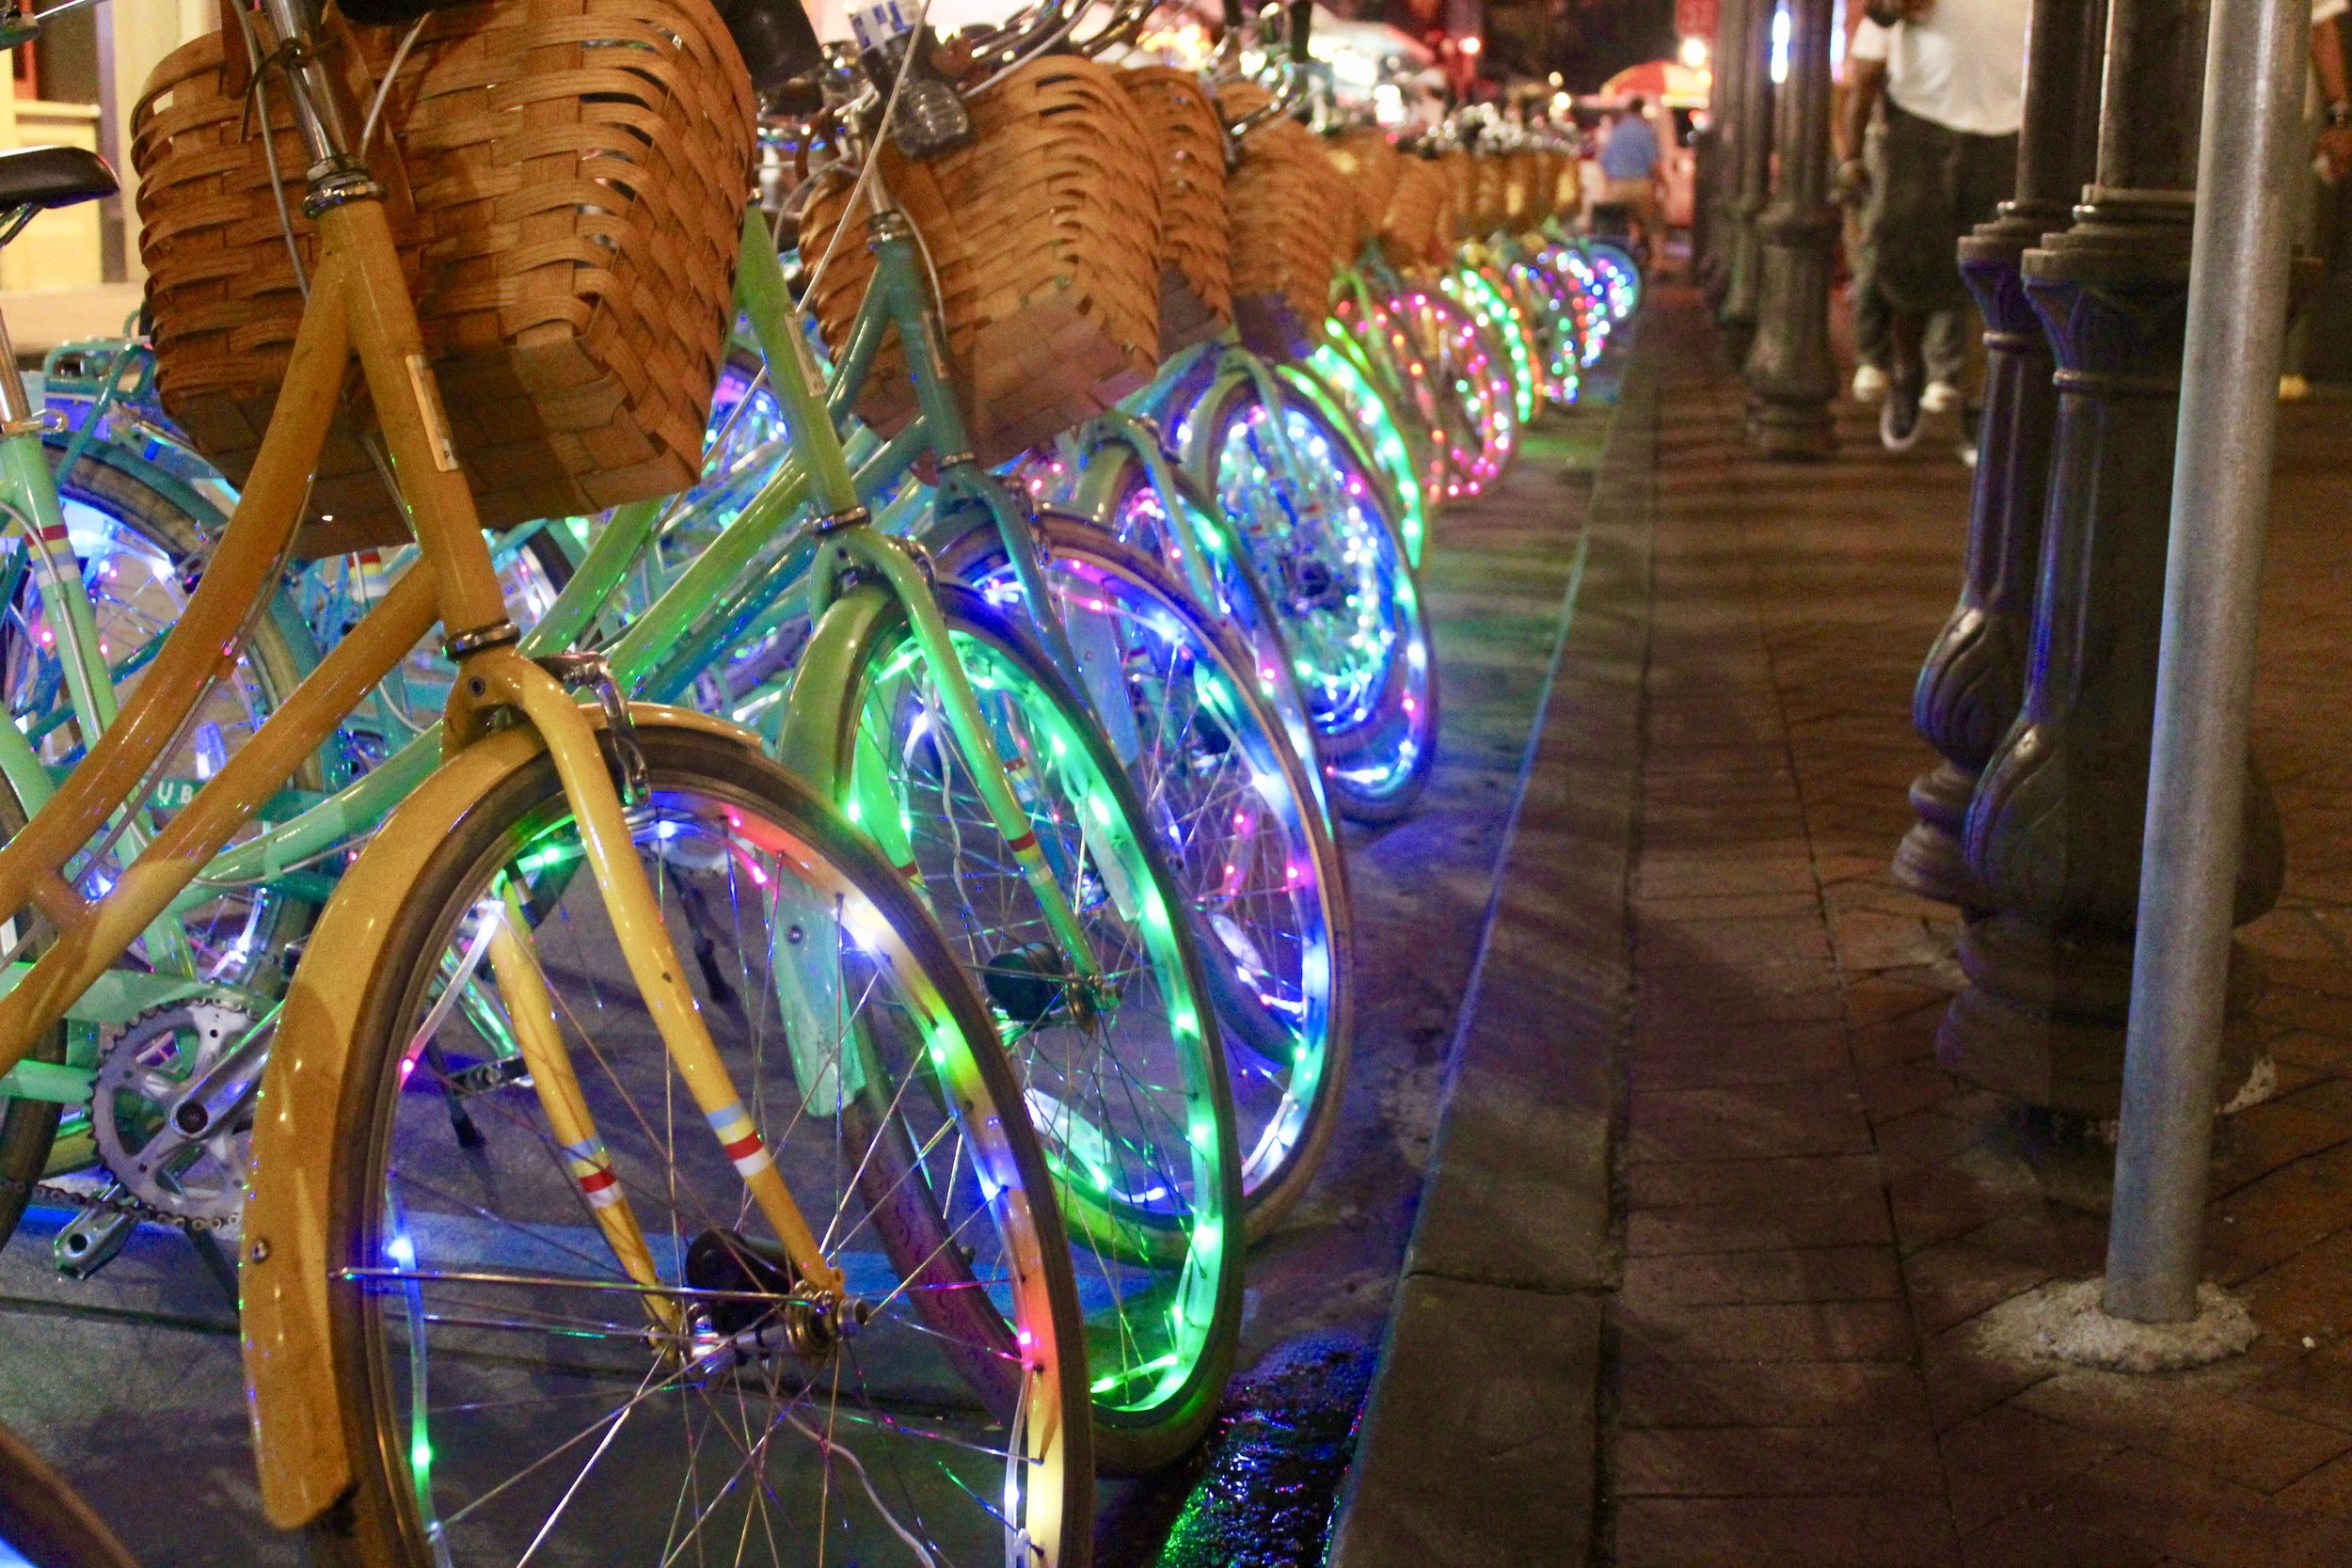 Night bike ride with glowing wheels in Nola.